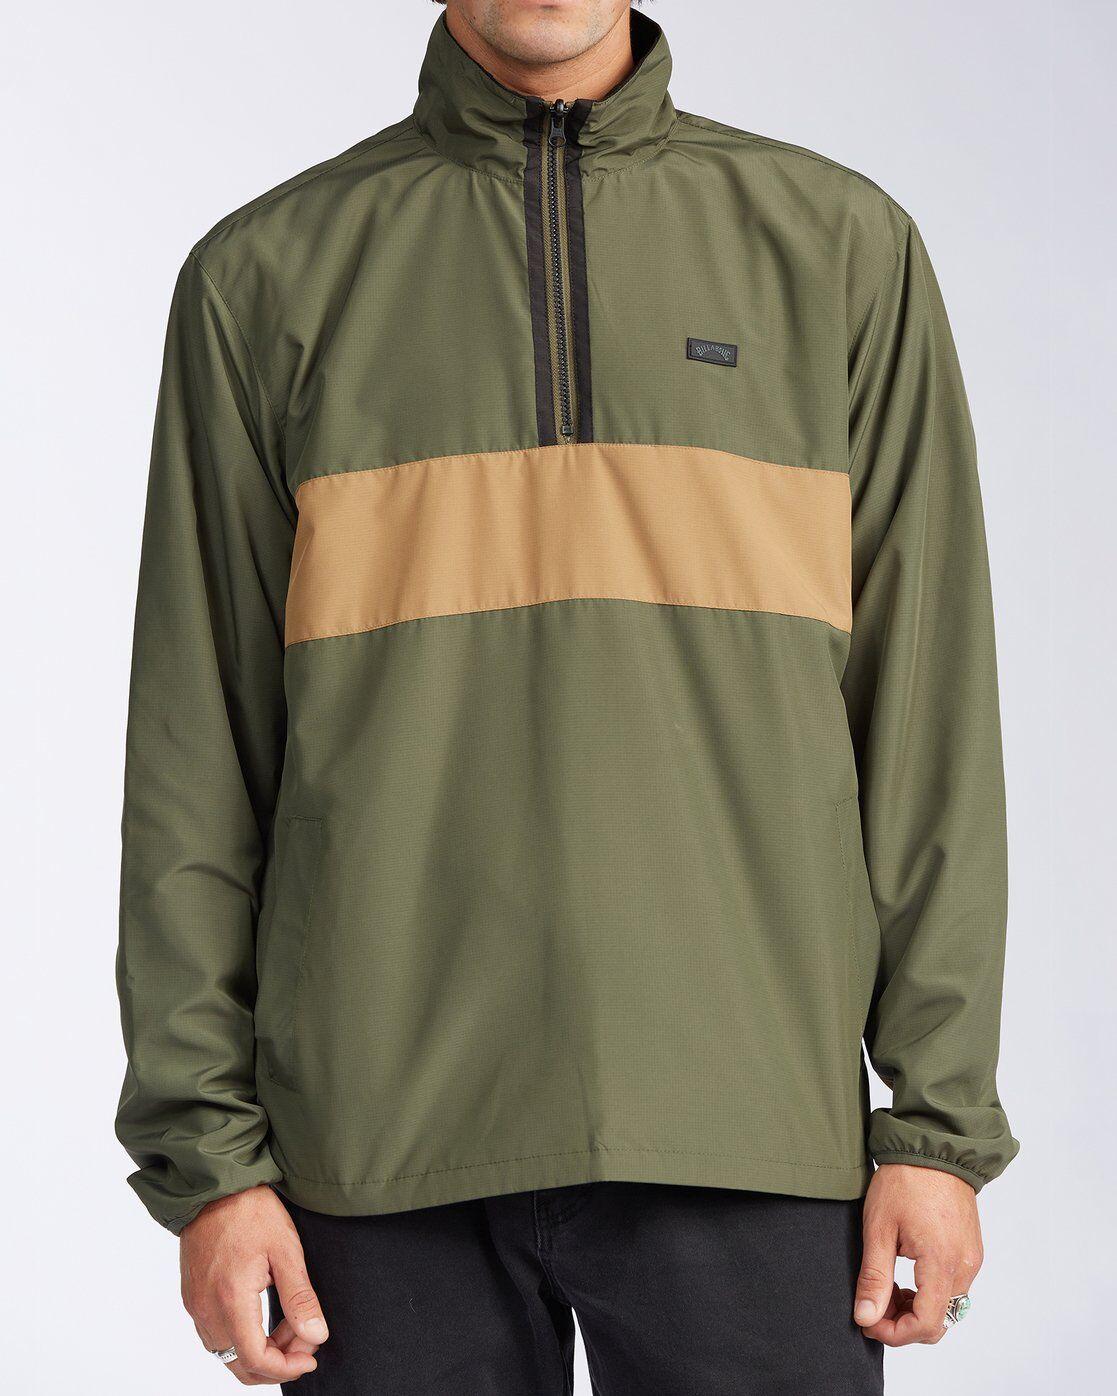 Billabong Highland Reversible Jacket  - Green - Size: Extra Large